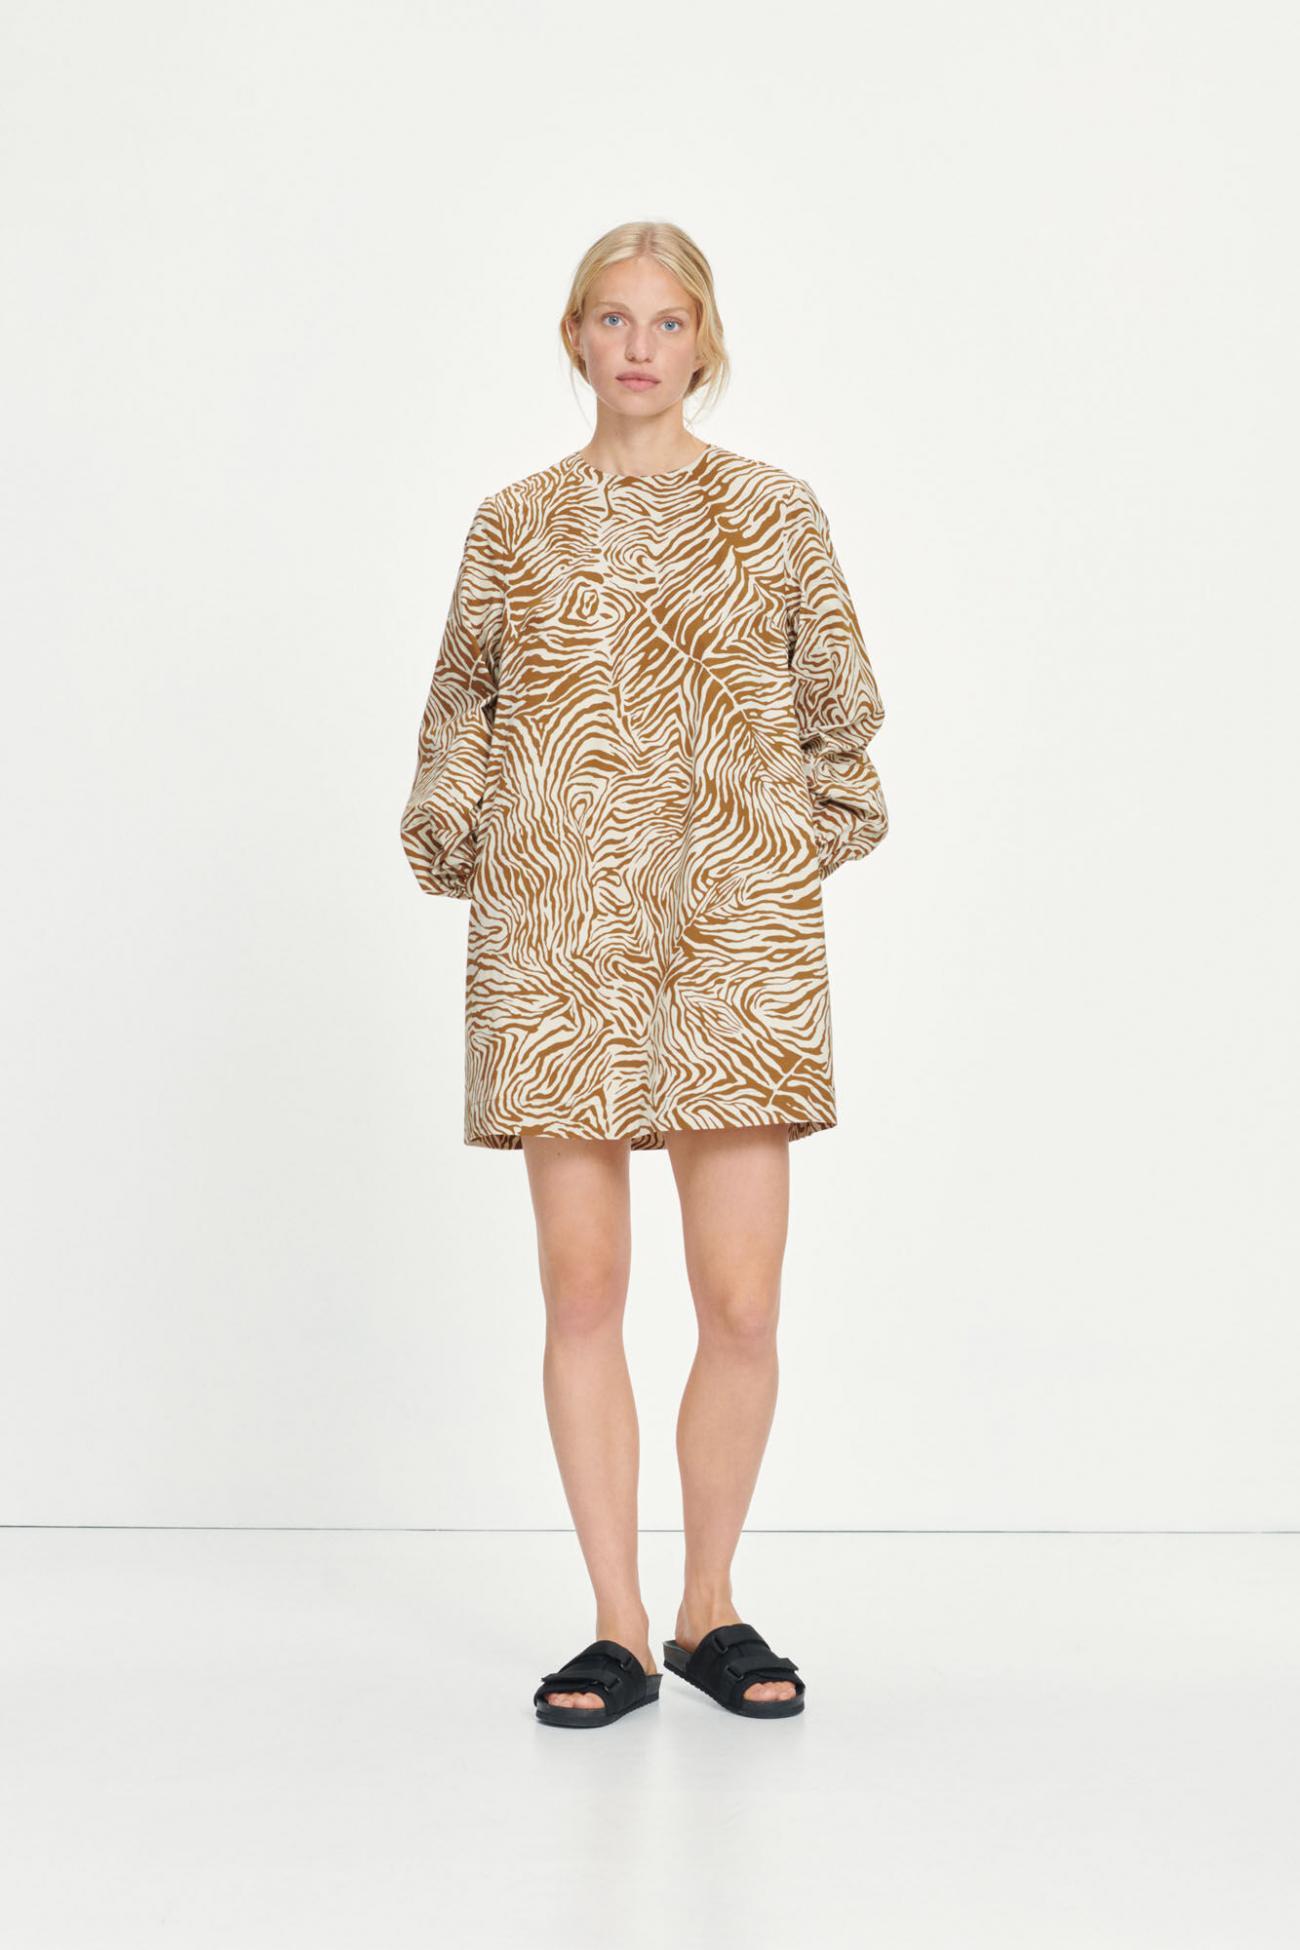 aram-short-dress-aop-10783-mountain-zebra-samsc3b8e-samsc3b8e-womens-clothing-1